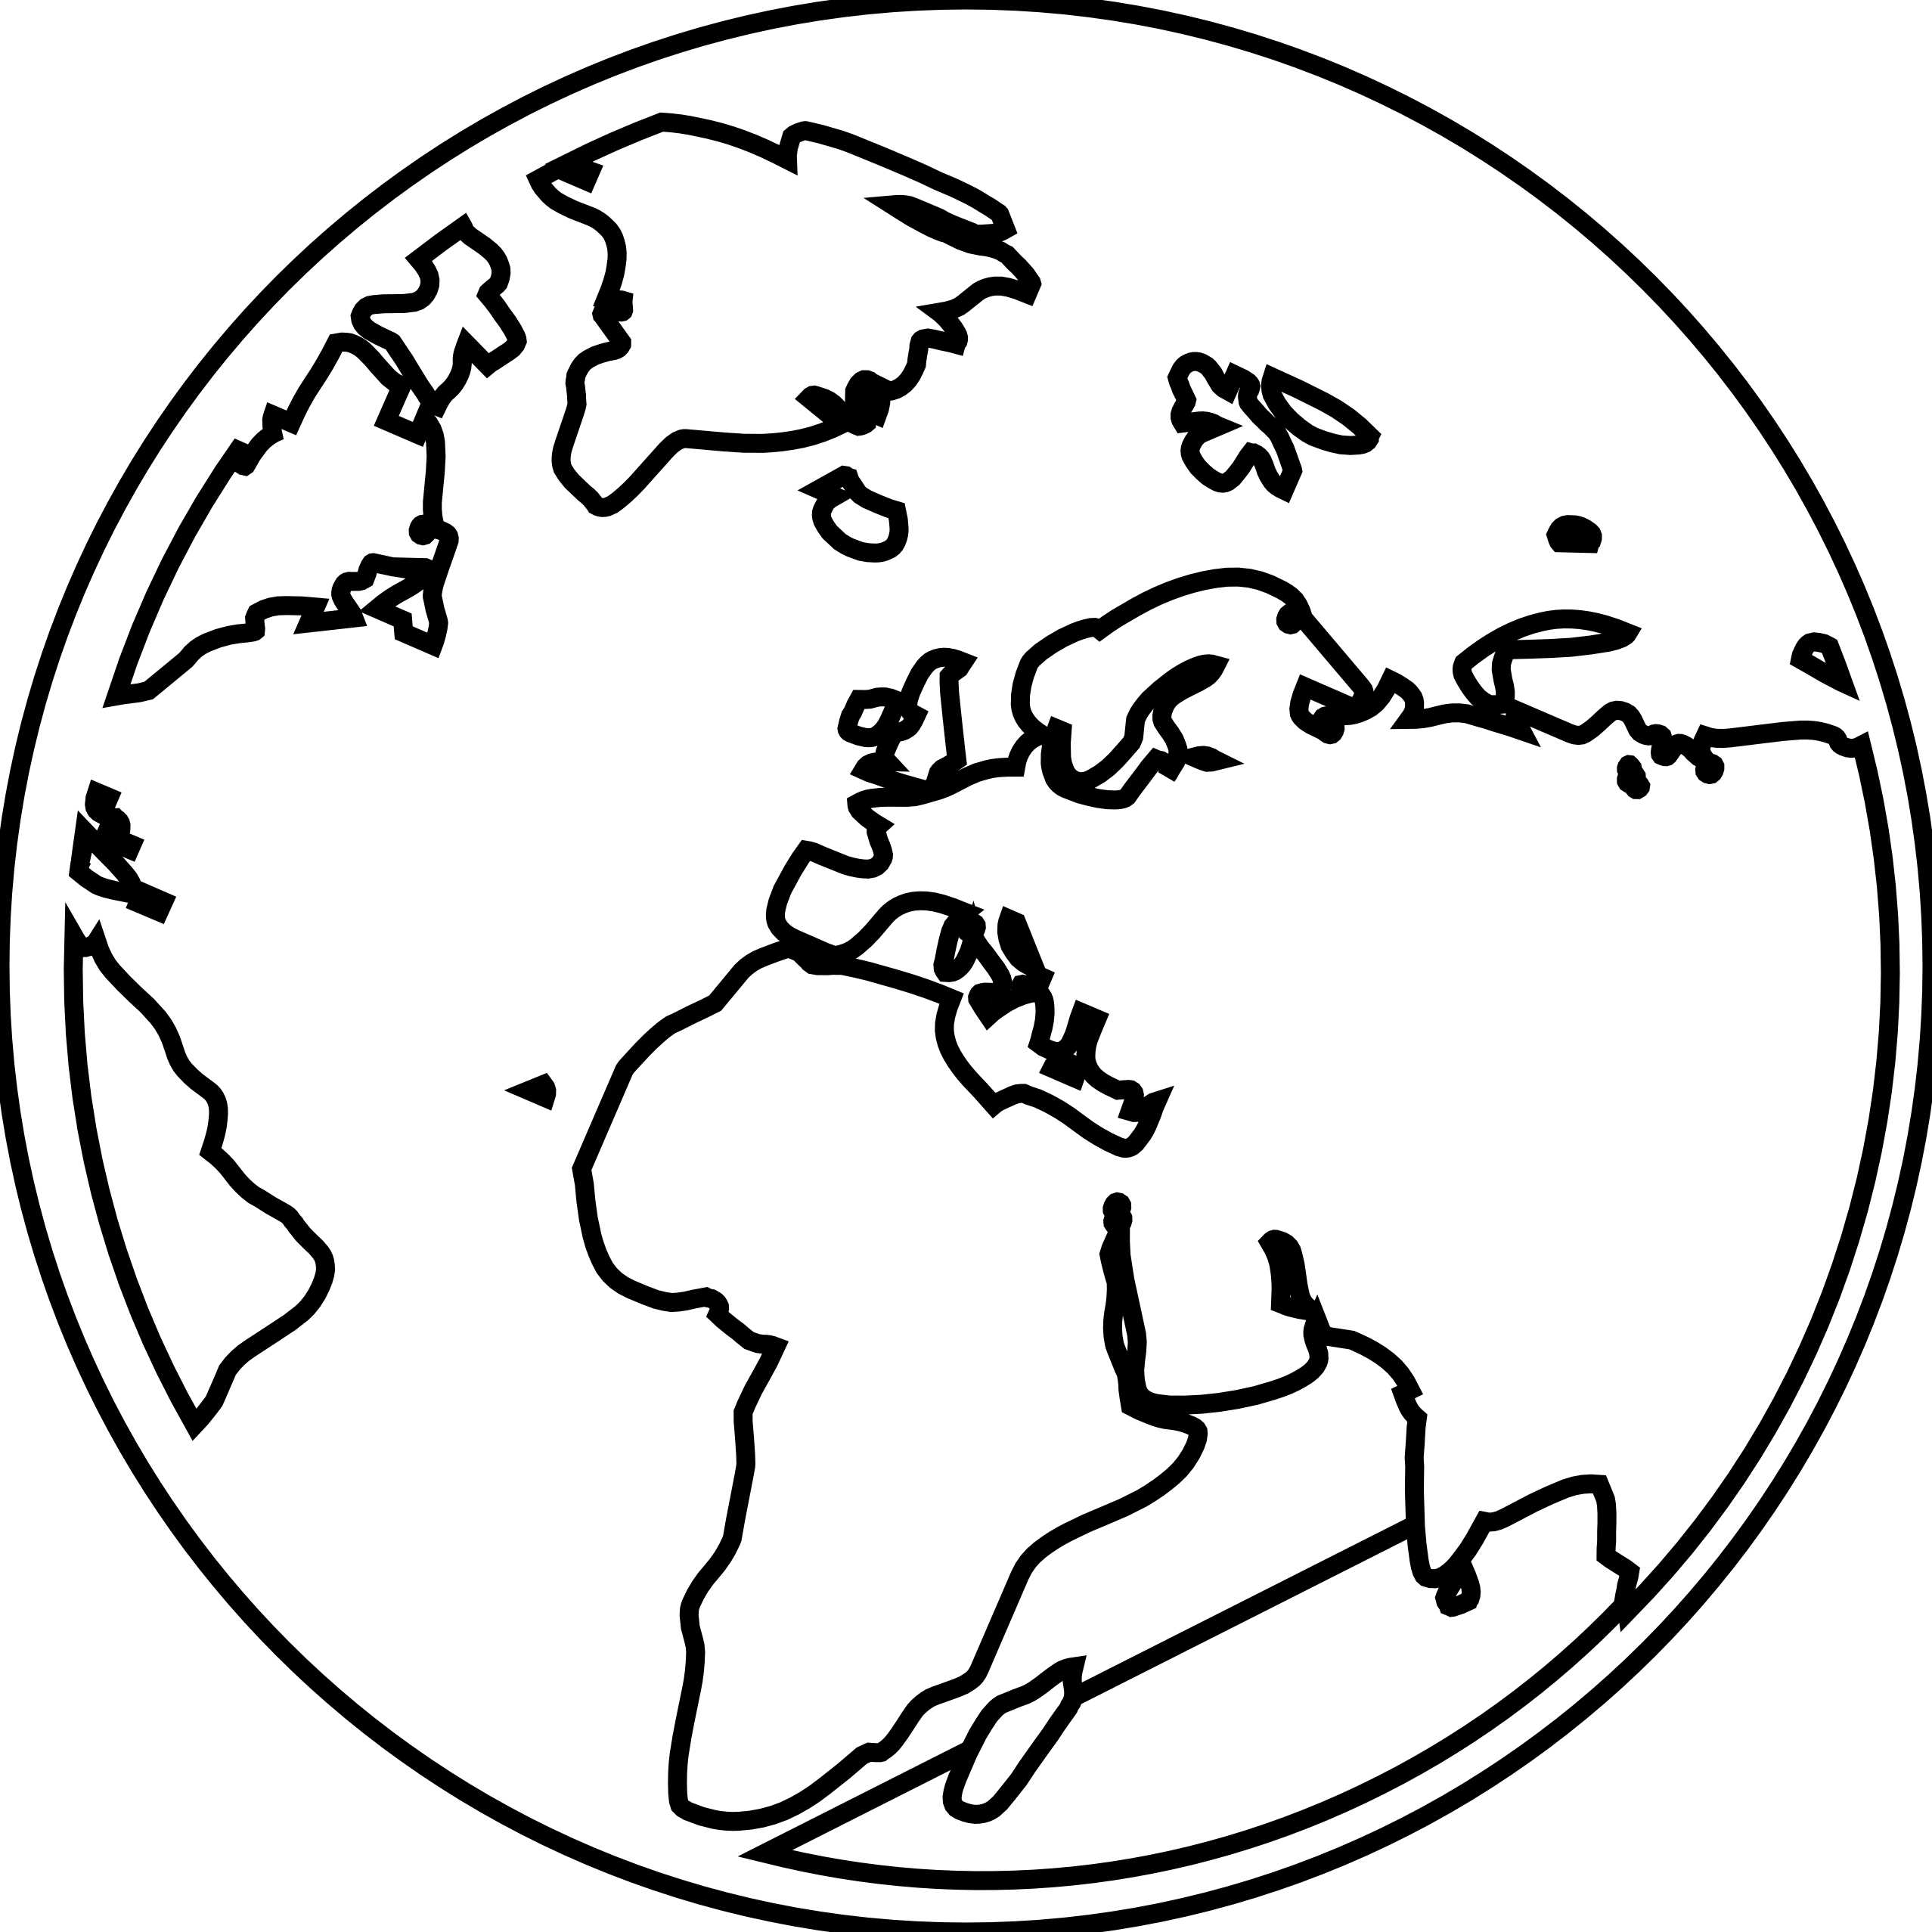 world globe black and white clipart clipart suggest flaming baseball logo free download Baseball On Fire Logo